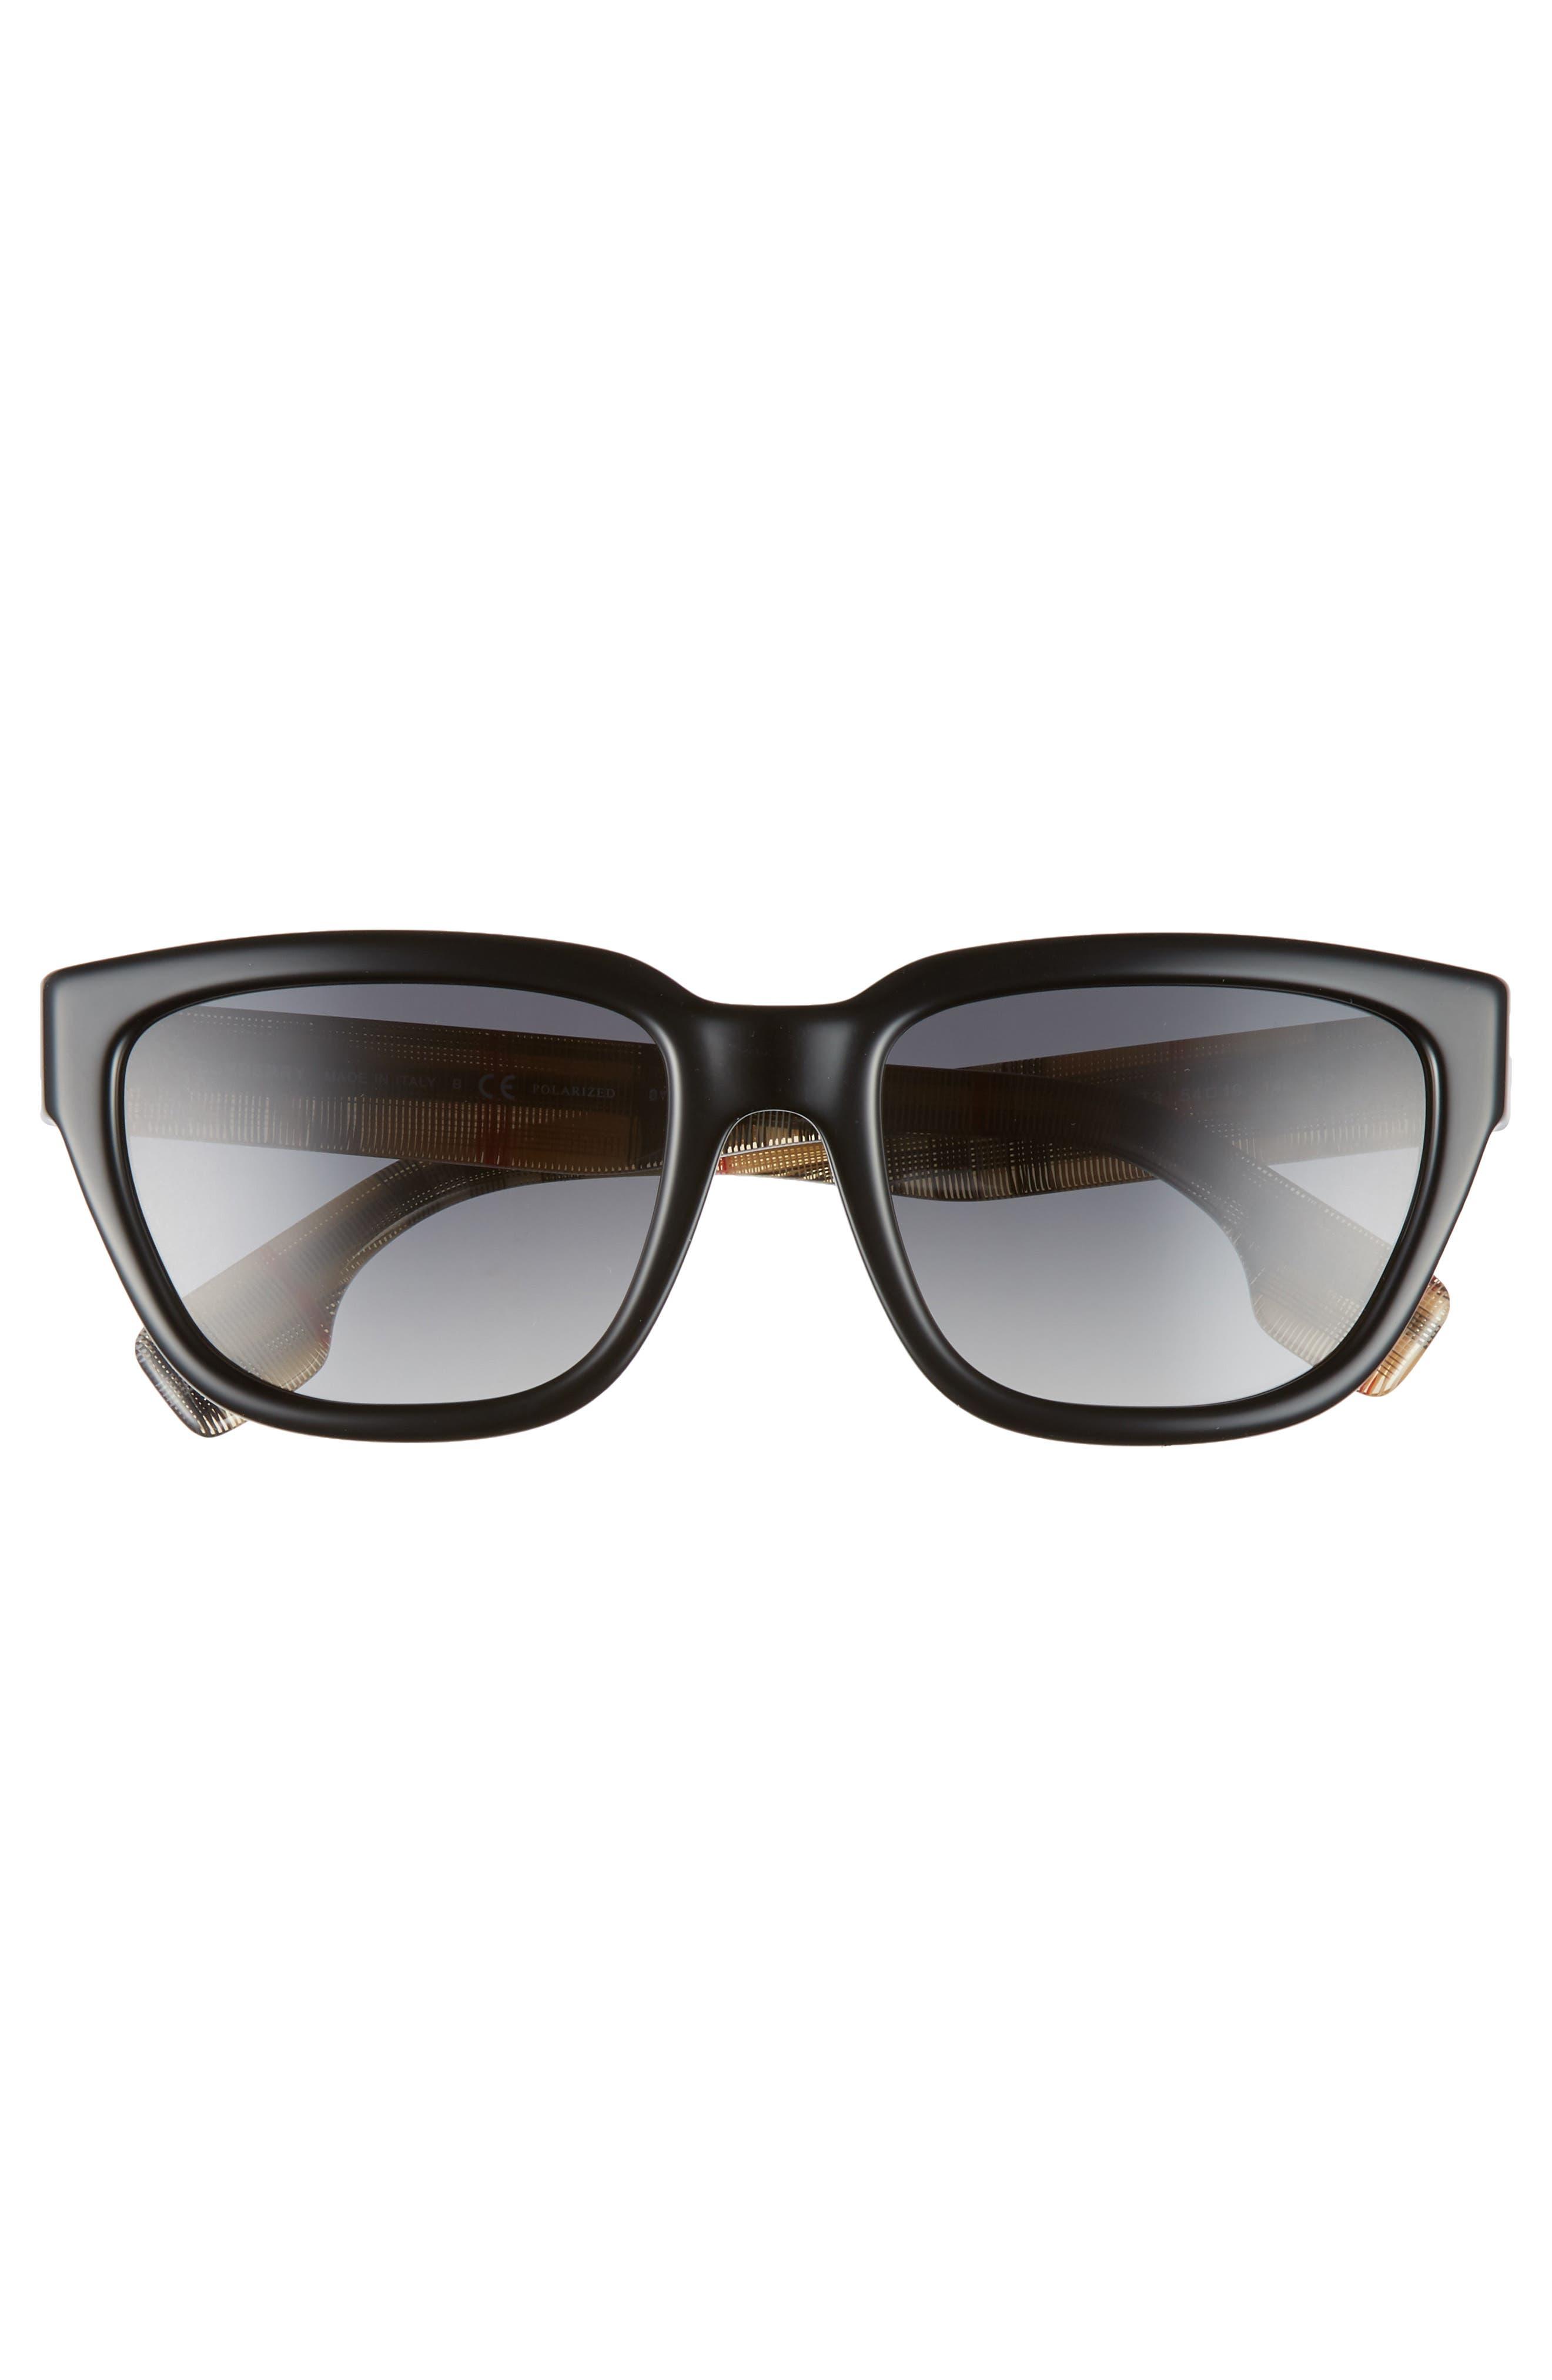 54mm Polarized Gradient Square Sunglasses,                             Alternate thumbnail 3, color,                             BLACK/ BLACK GRADIENT